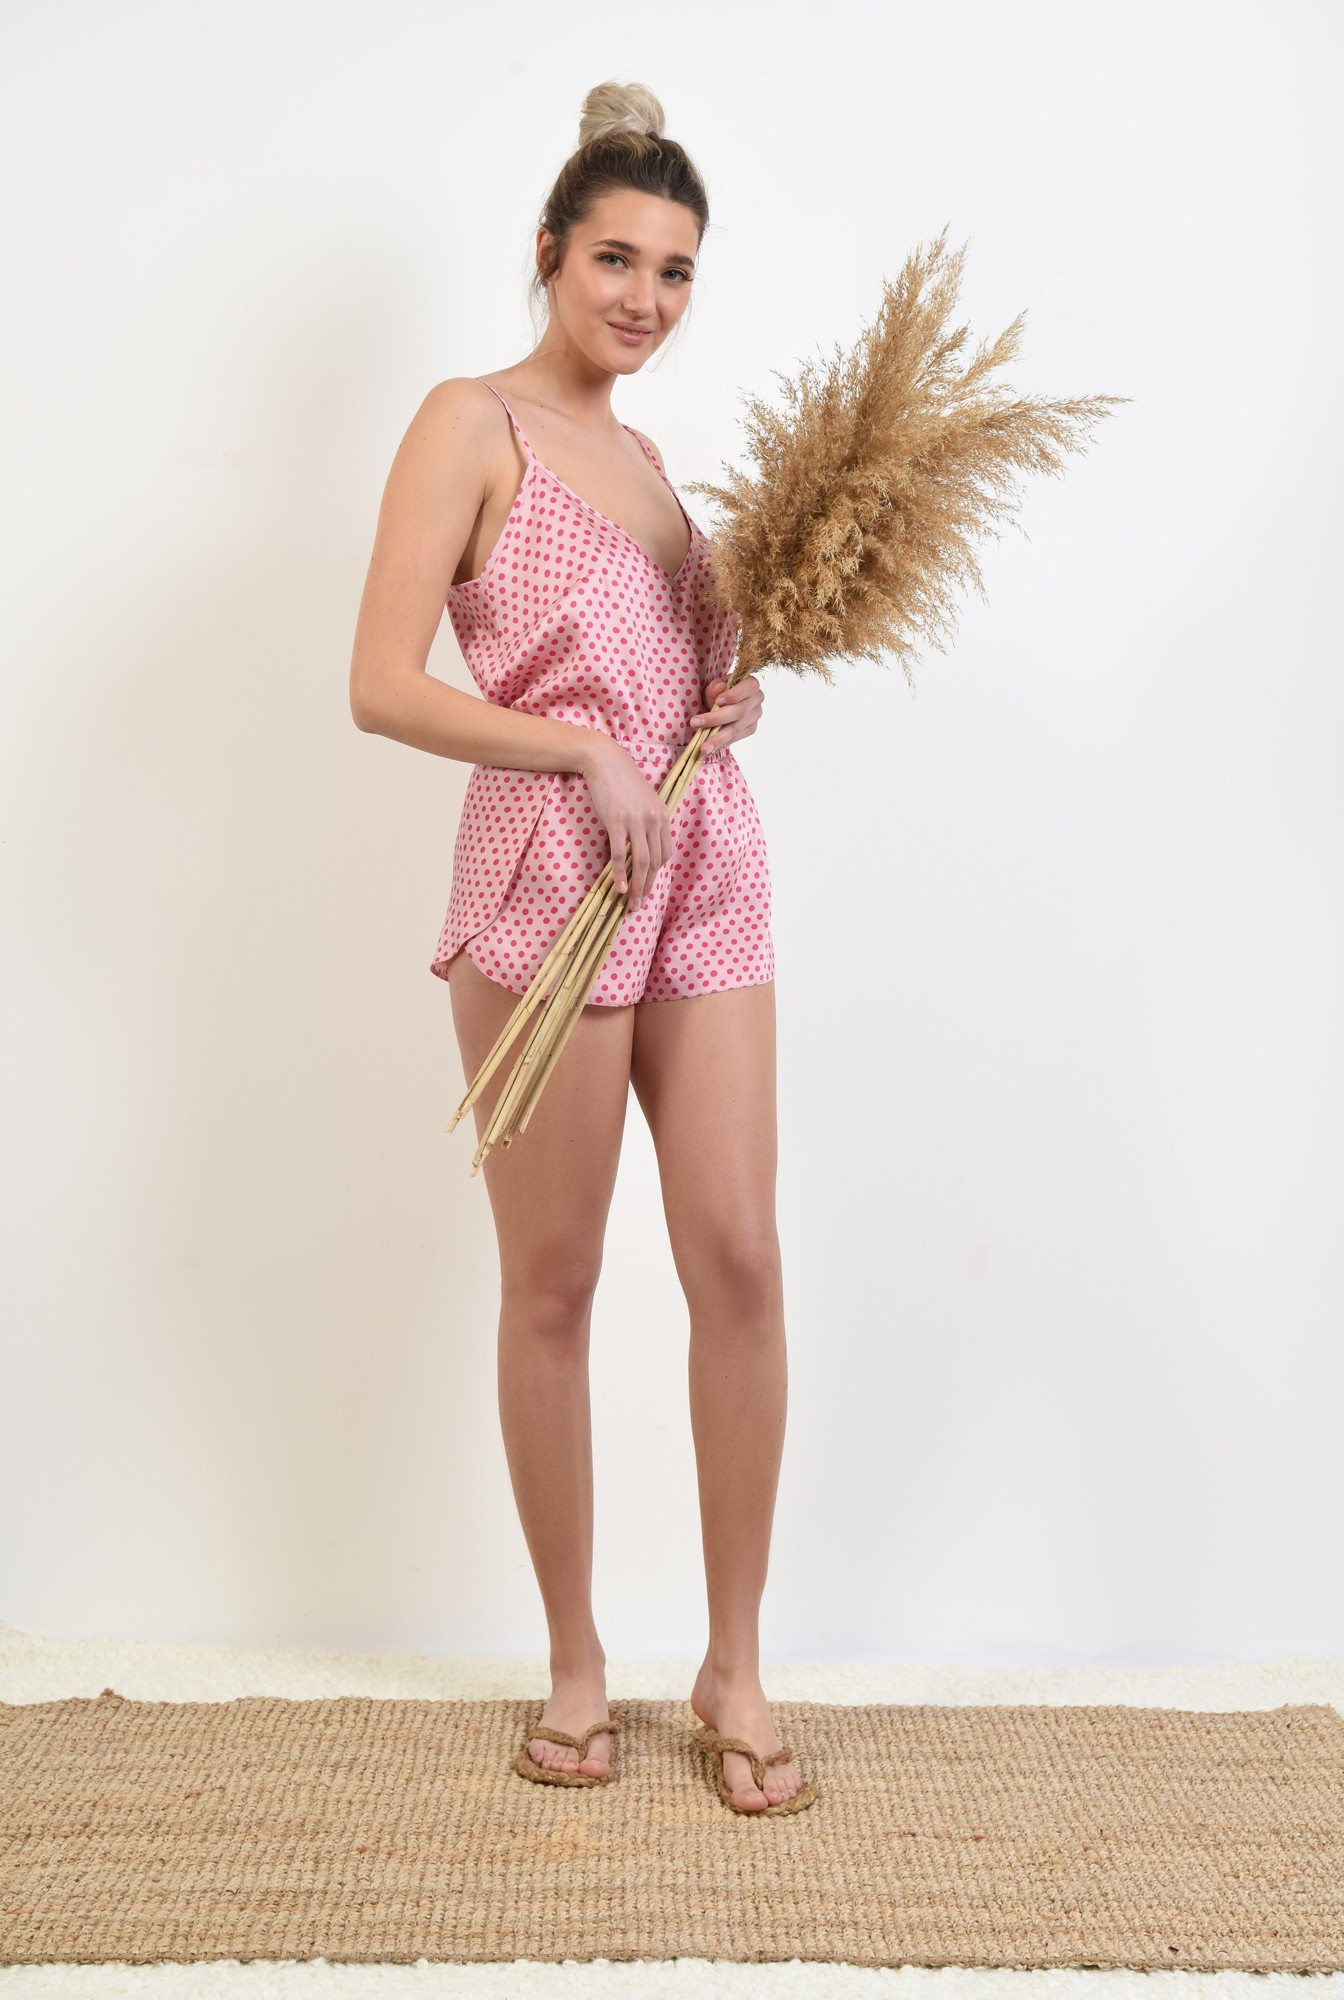 3 - 360 - sort din satin, cu imprimeu geometric, buline roz, pantaloni scurti